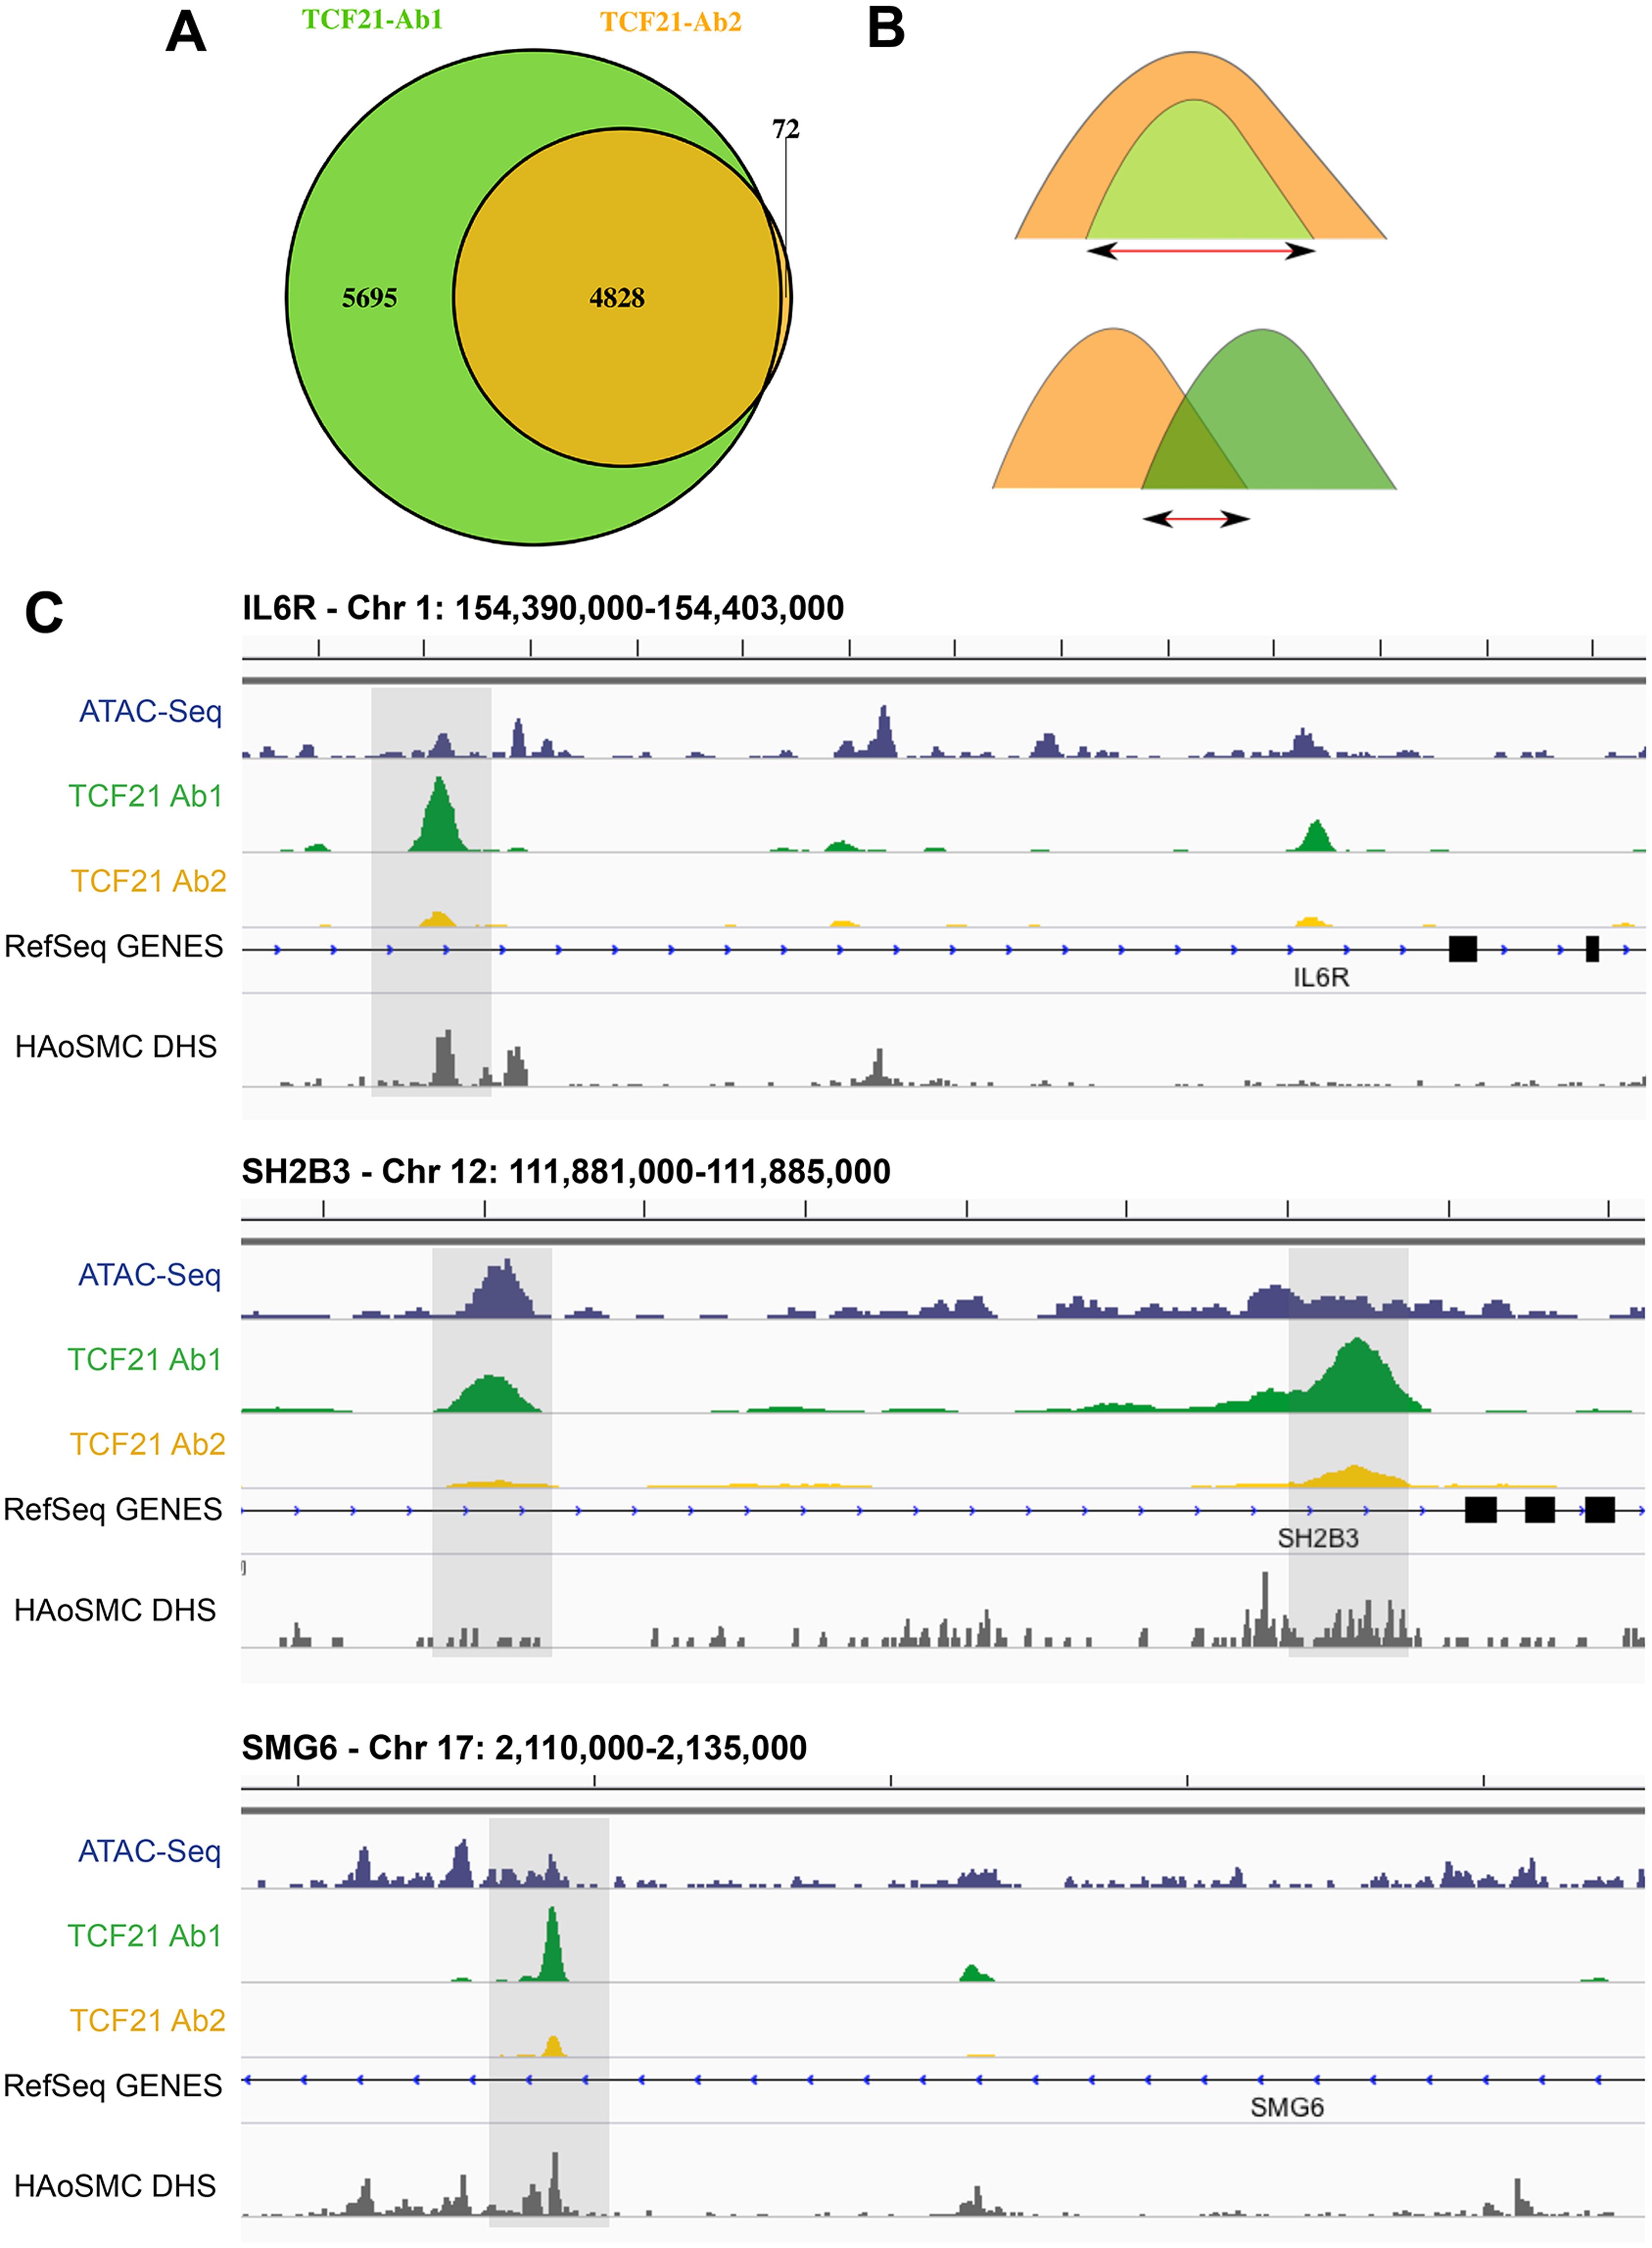 Two TCF21 antibodies show overlapping patterns of TCF21 chromosomal binding.